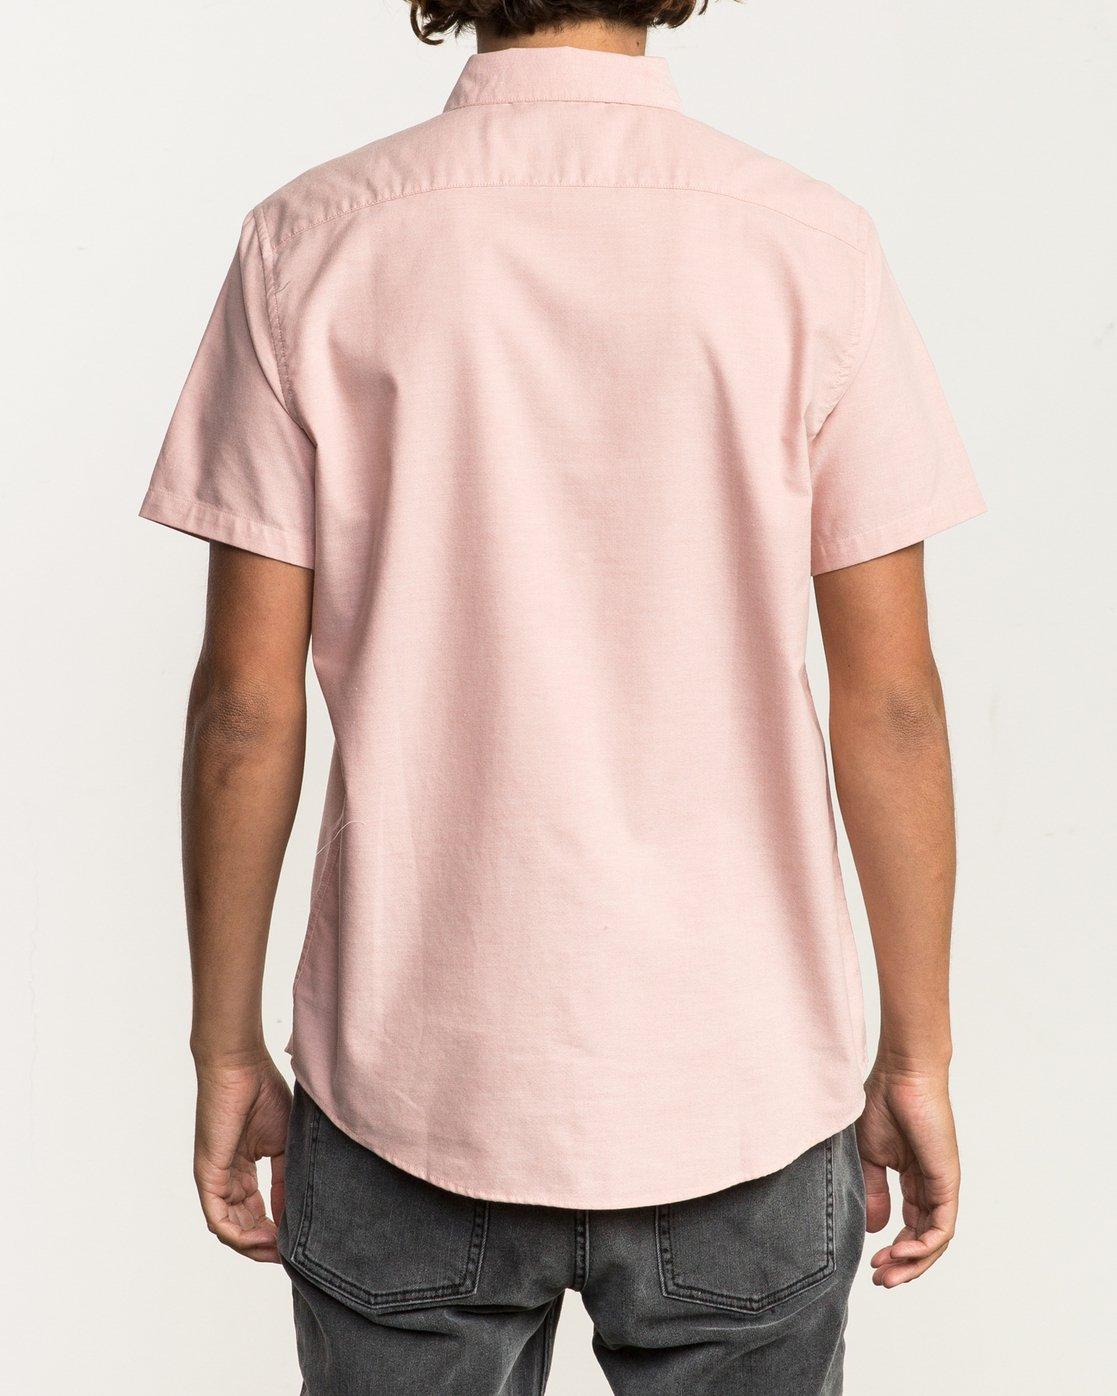 3 That'll Do Stretch Short Sleeve Shirt Brown MK515TDS RVCA